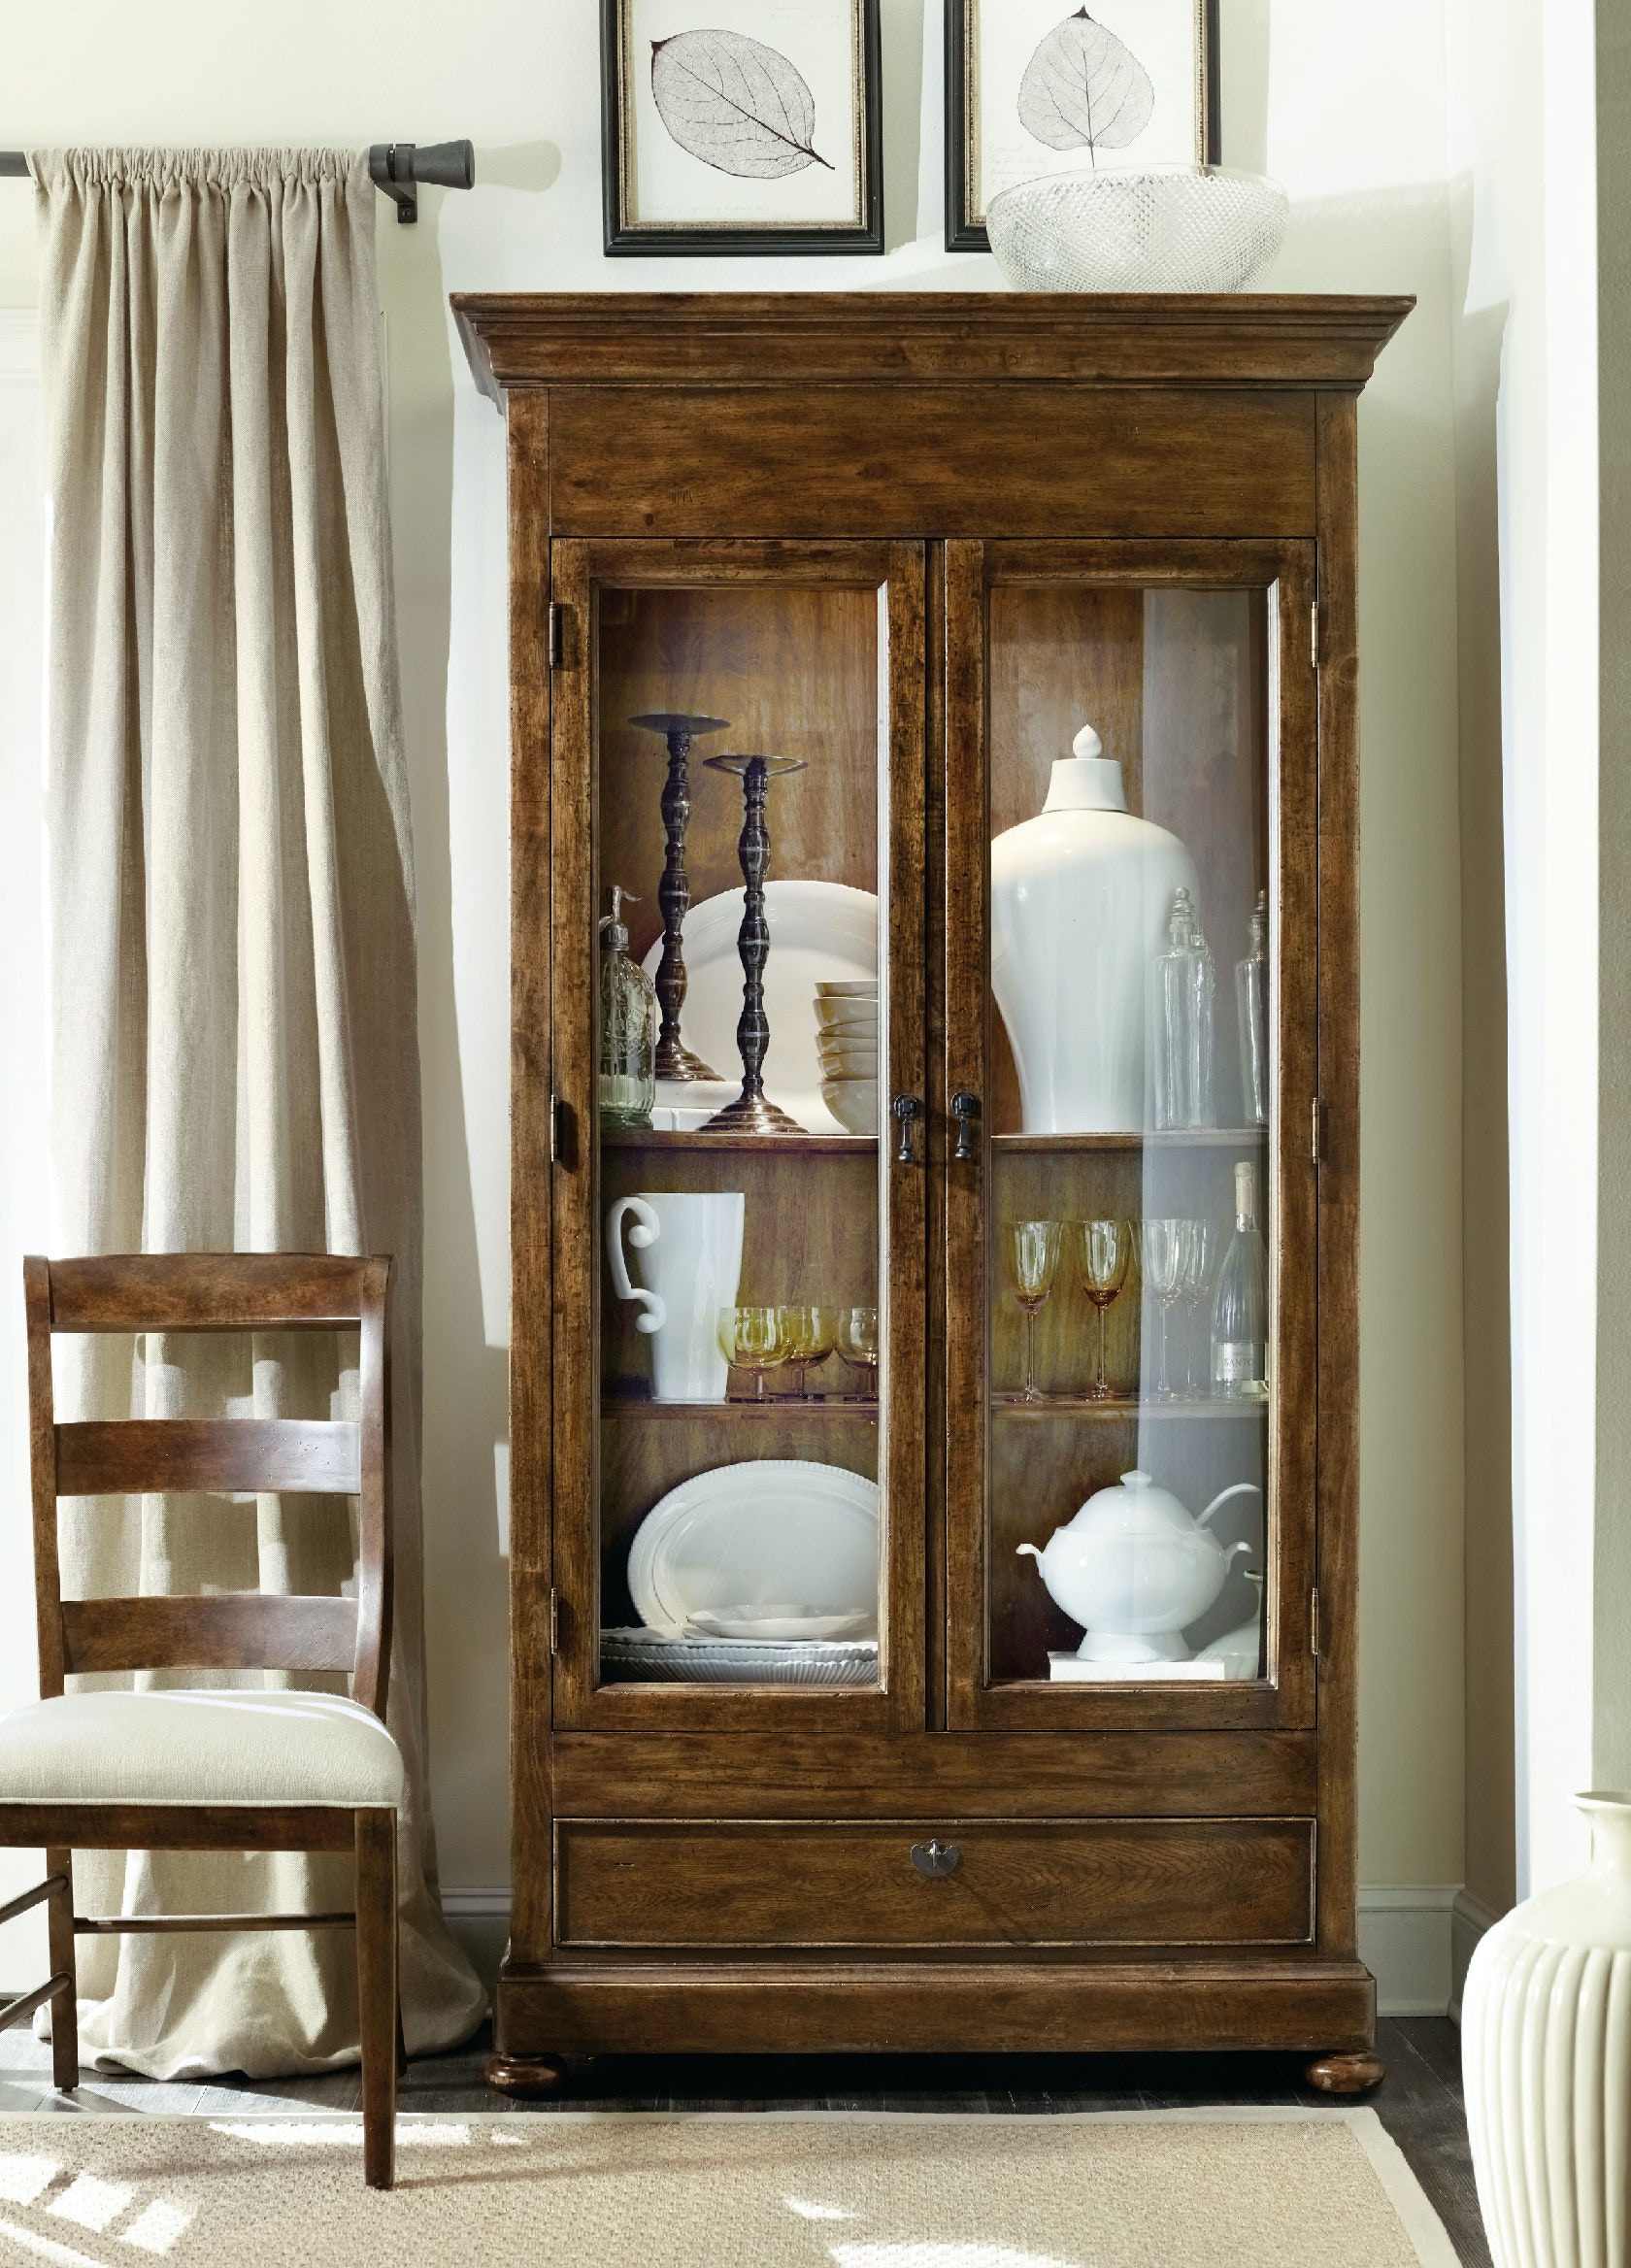 Hooker Furniture Dining Room Archivist Display Cabinet 5447-75908